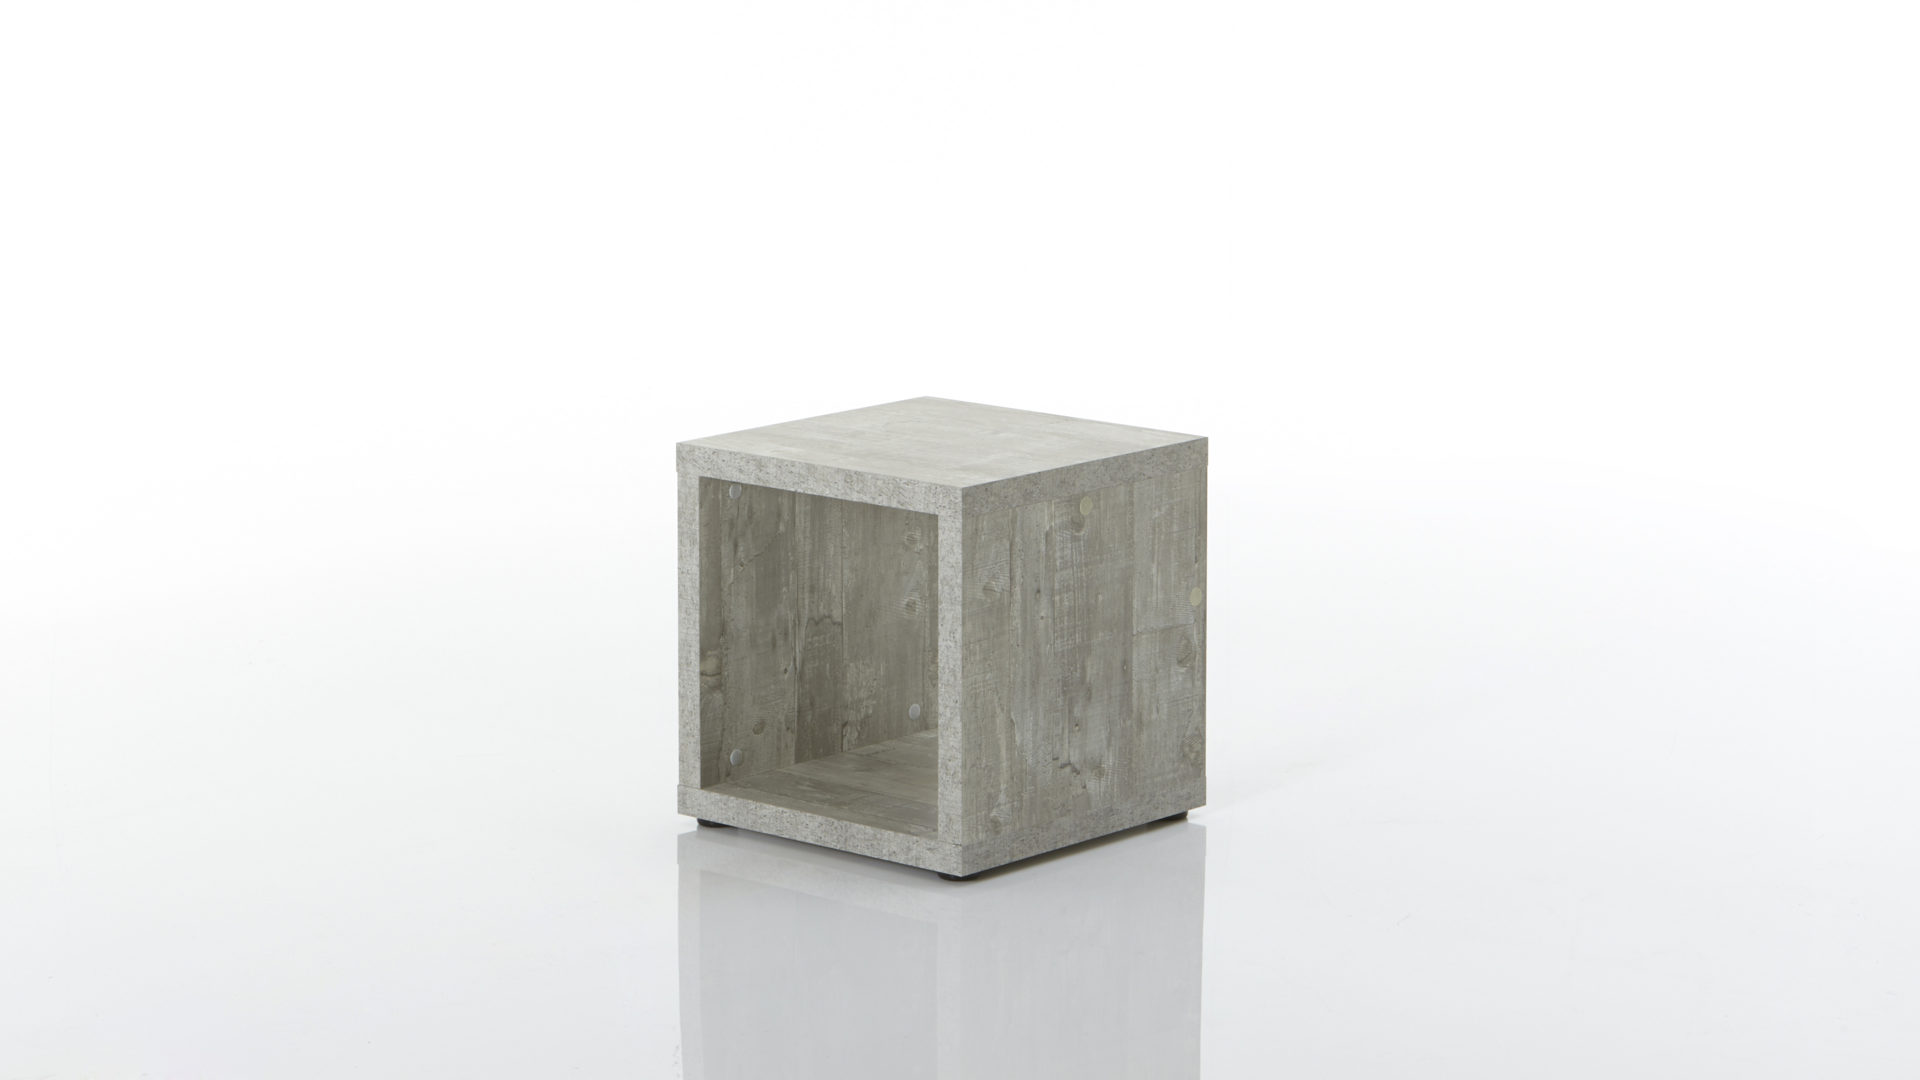 Schön Büromöbel Karlsruhe Galerie - Hauptinnenideen - kakados.com